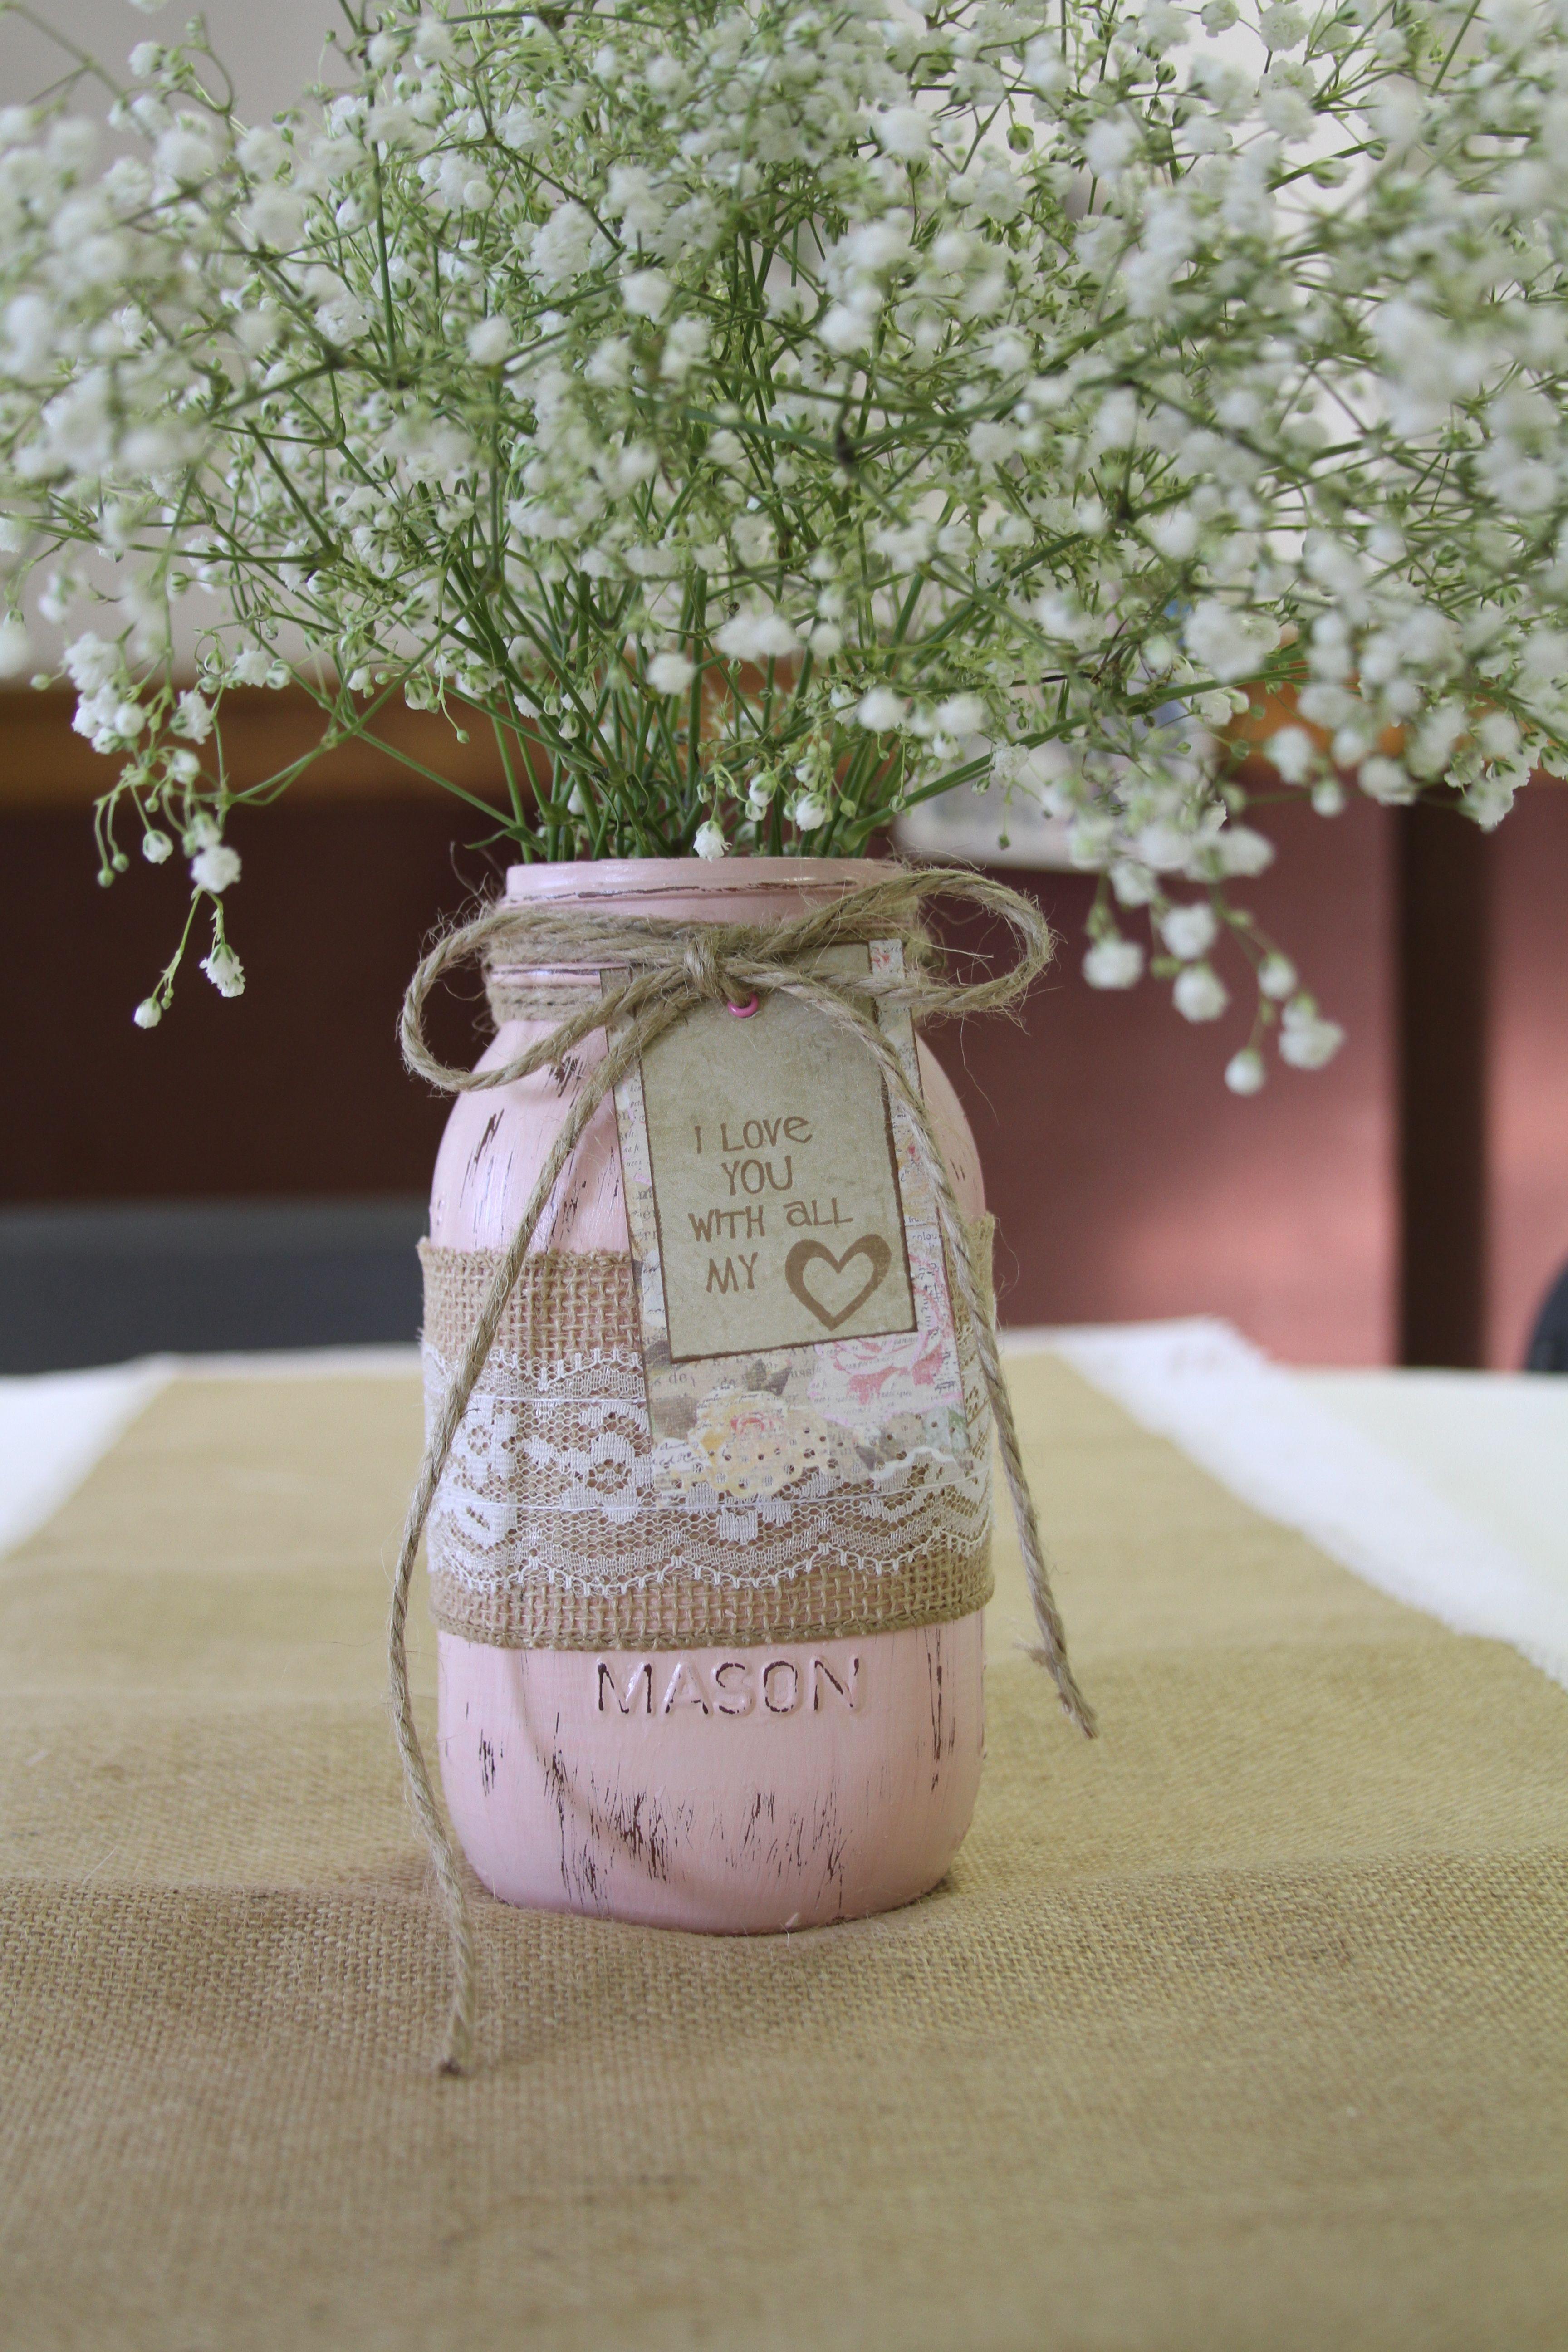 rustic wedding shower centerpiece chalk paint mason jar burlap and lace runner and fresh babys breath